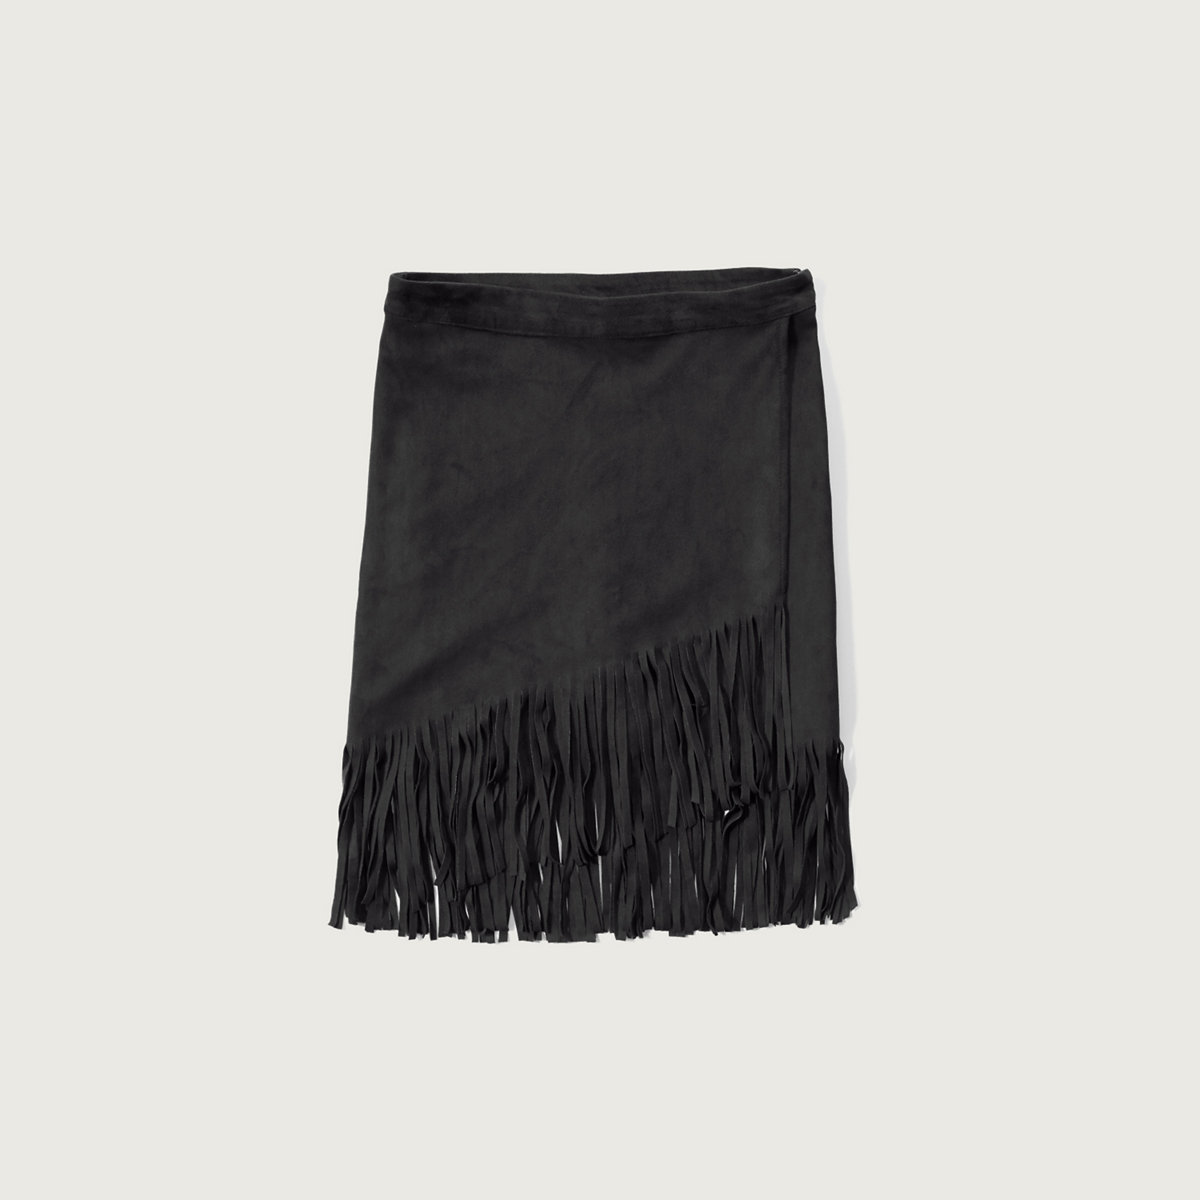 Fringe Faux Suede Skirt